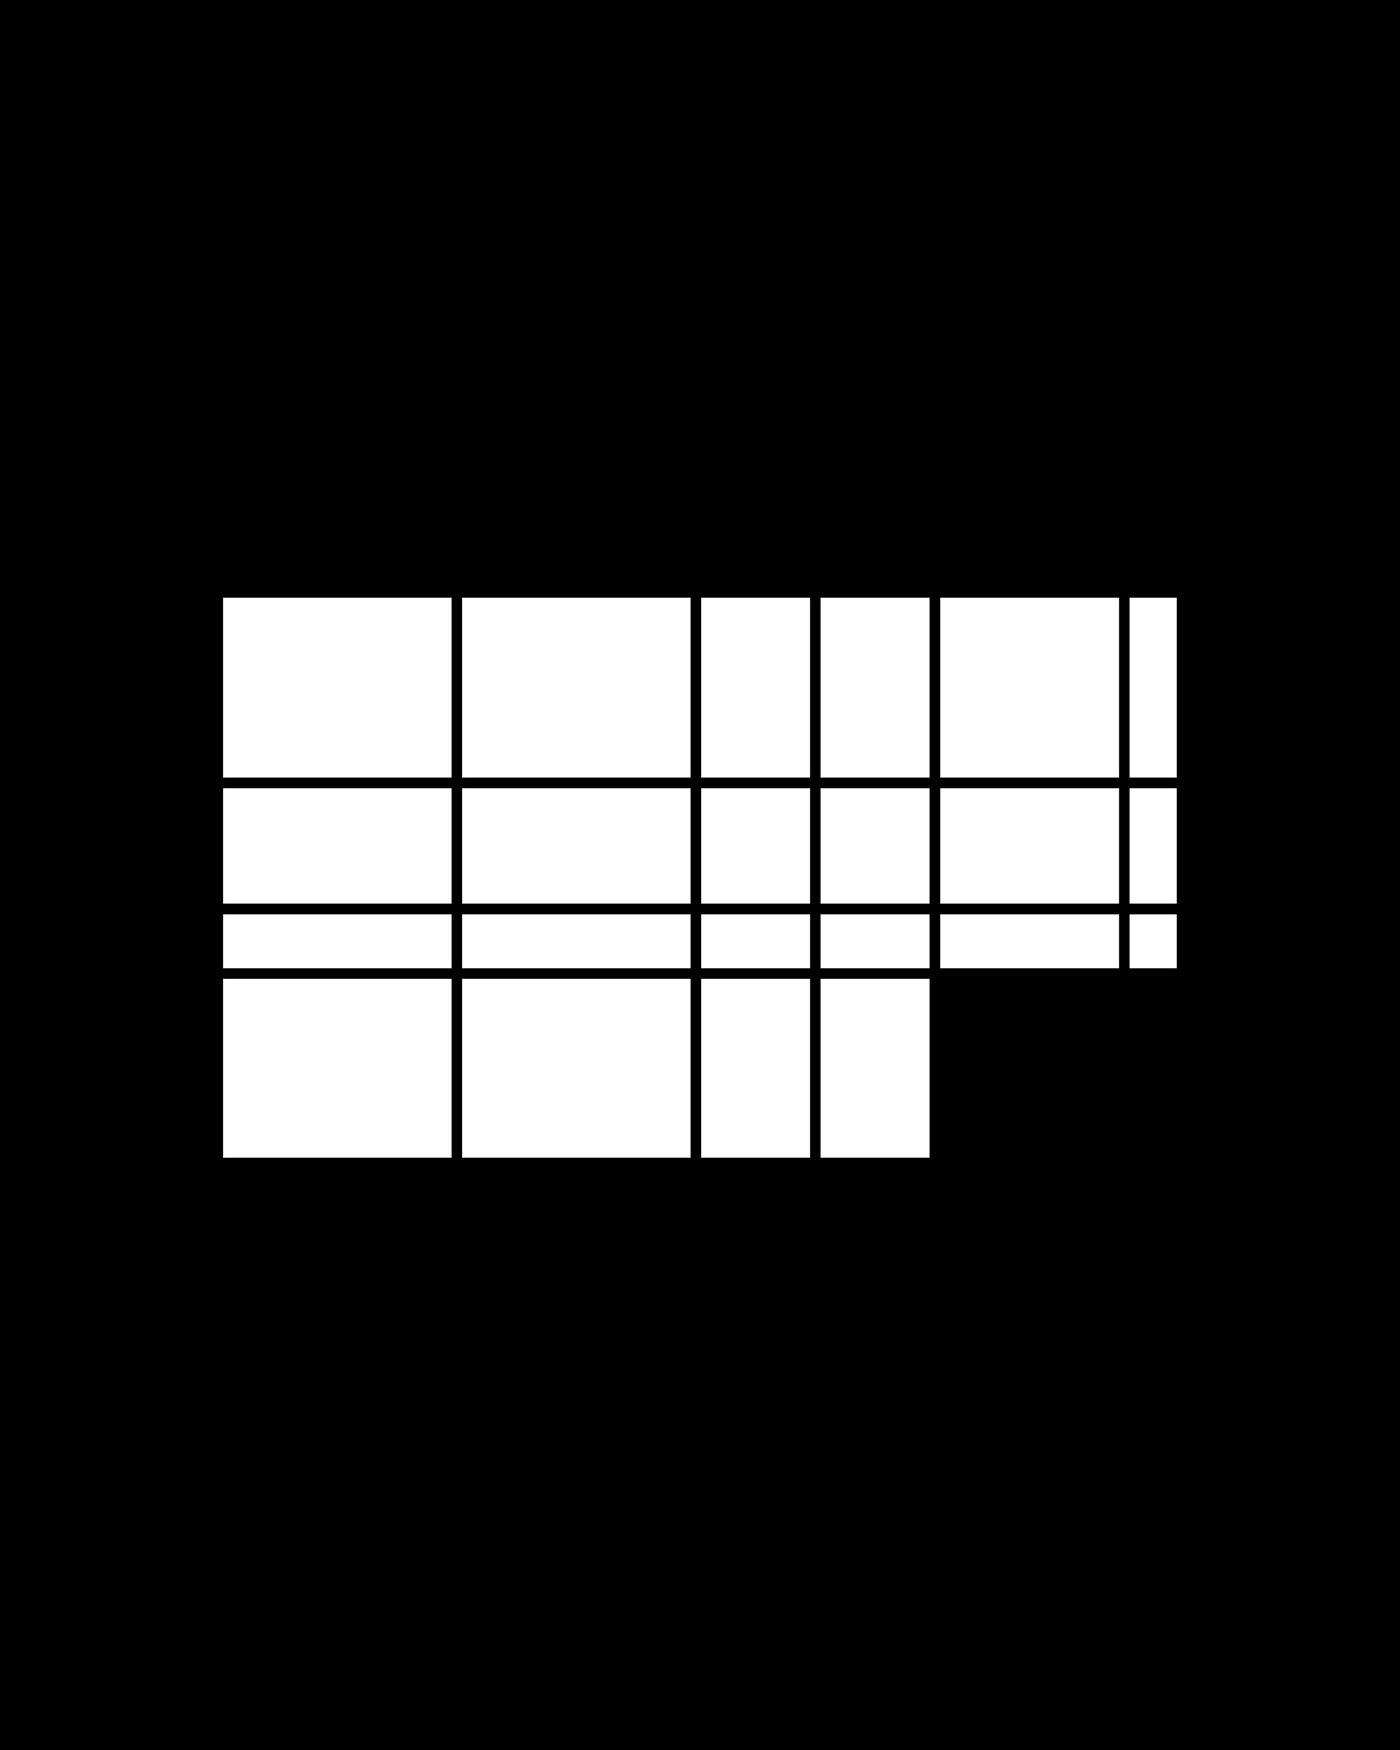 Image may contain: shoji and building